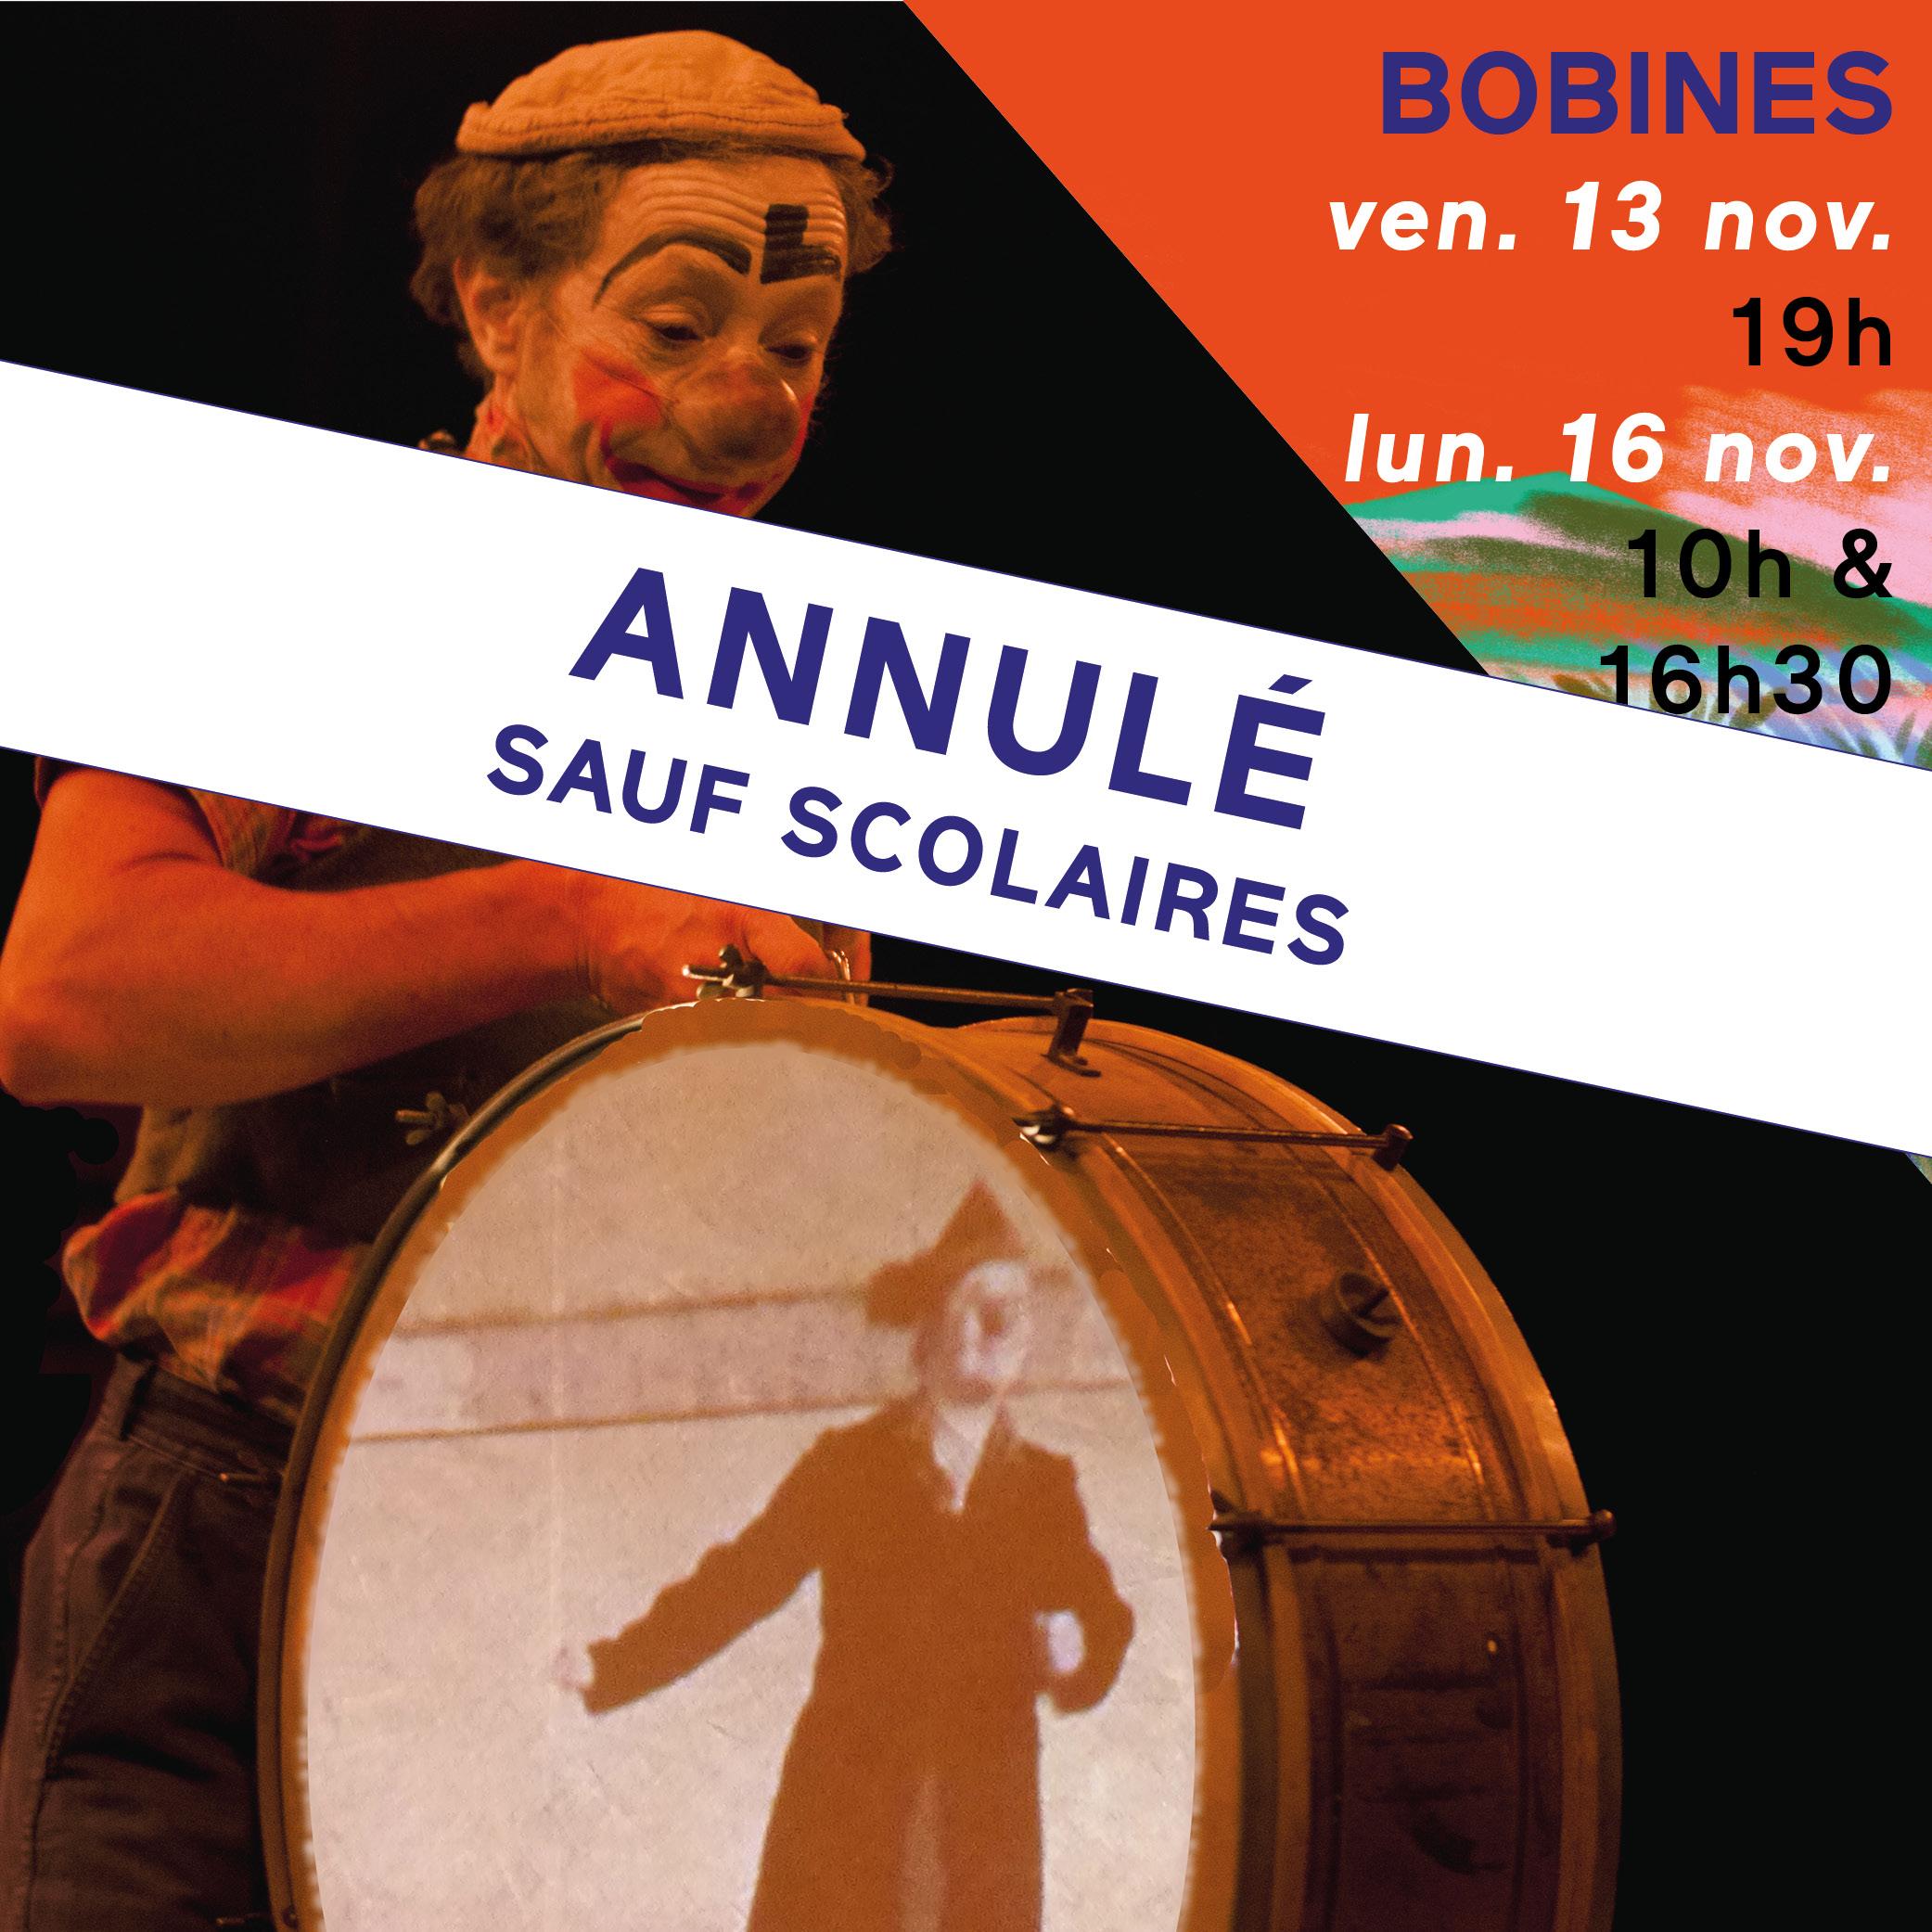 annulation bobines